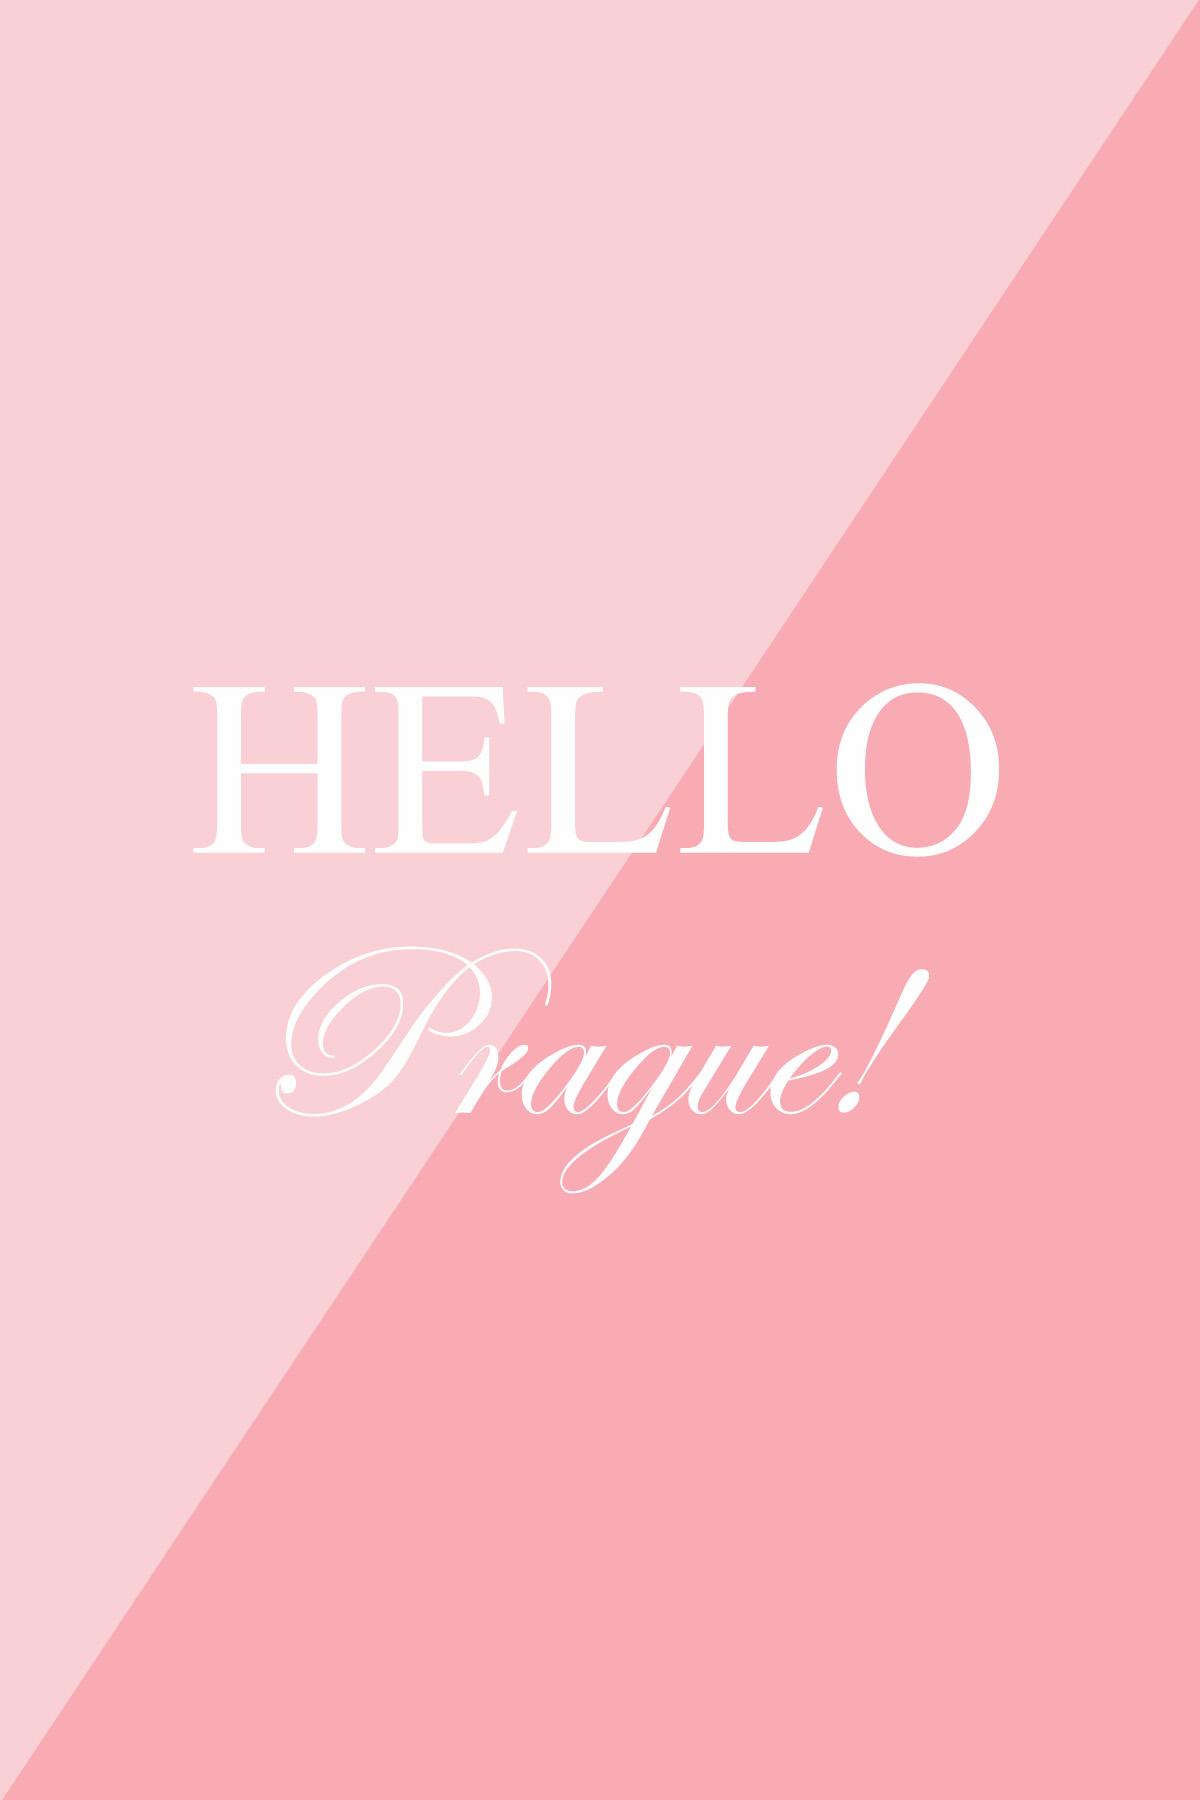 hello prague